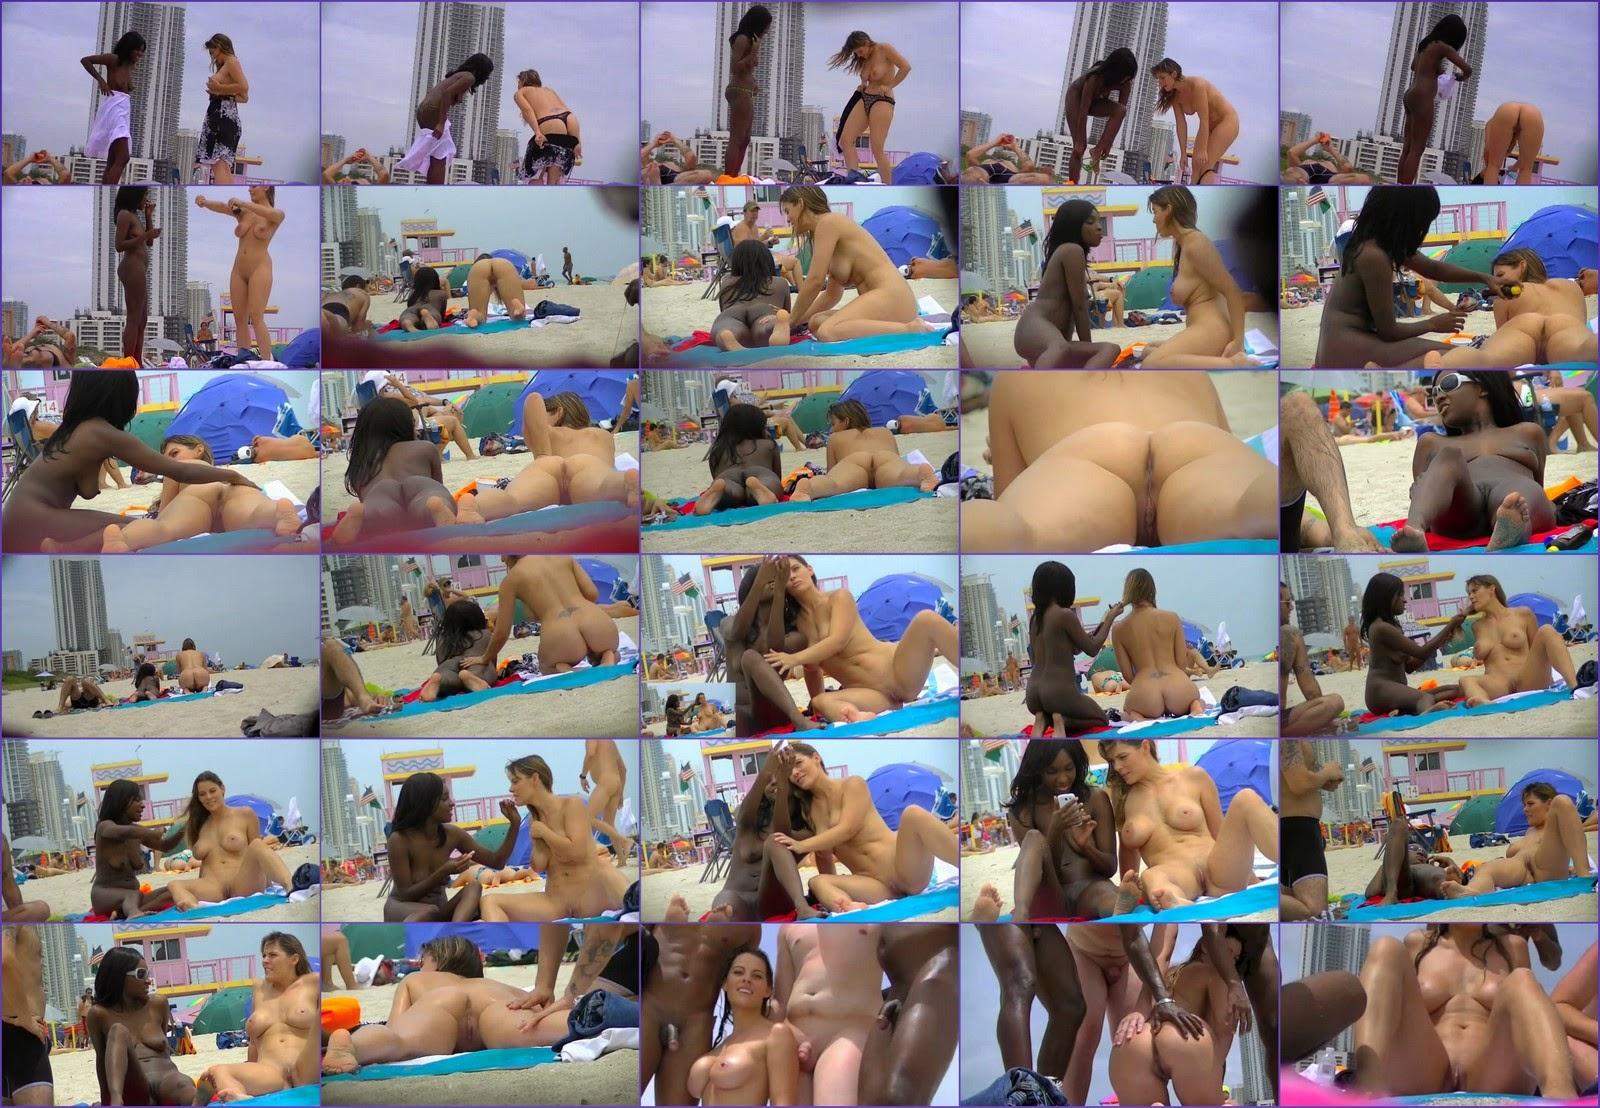 Подружки на голом пляже 1 / Girlfriends on the nude beach. Part-1.